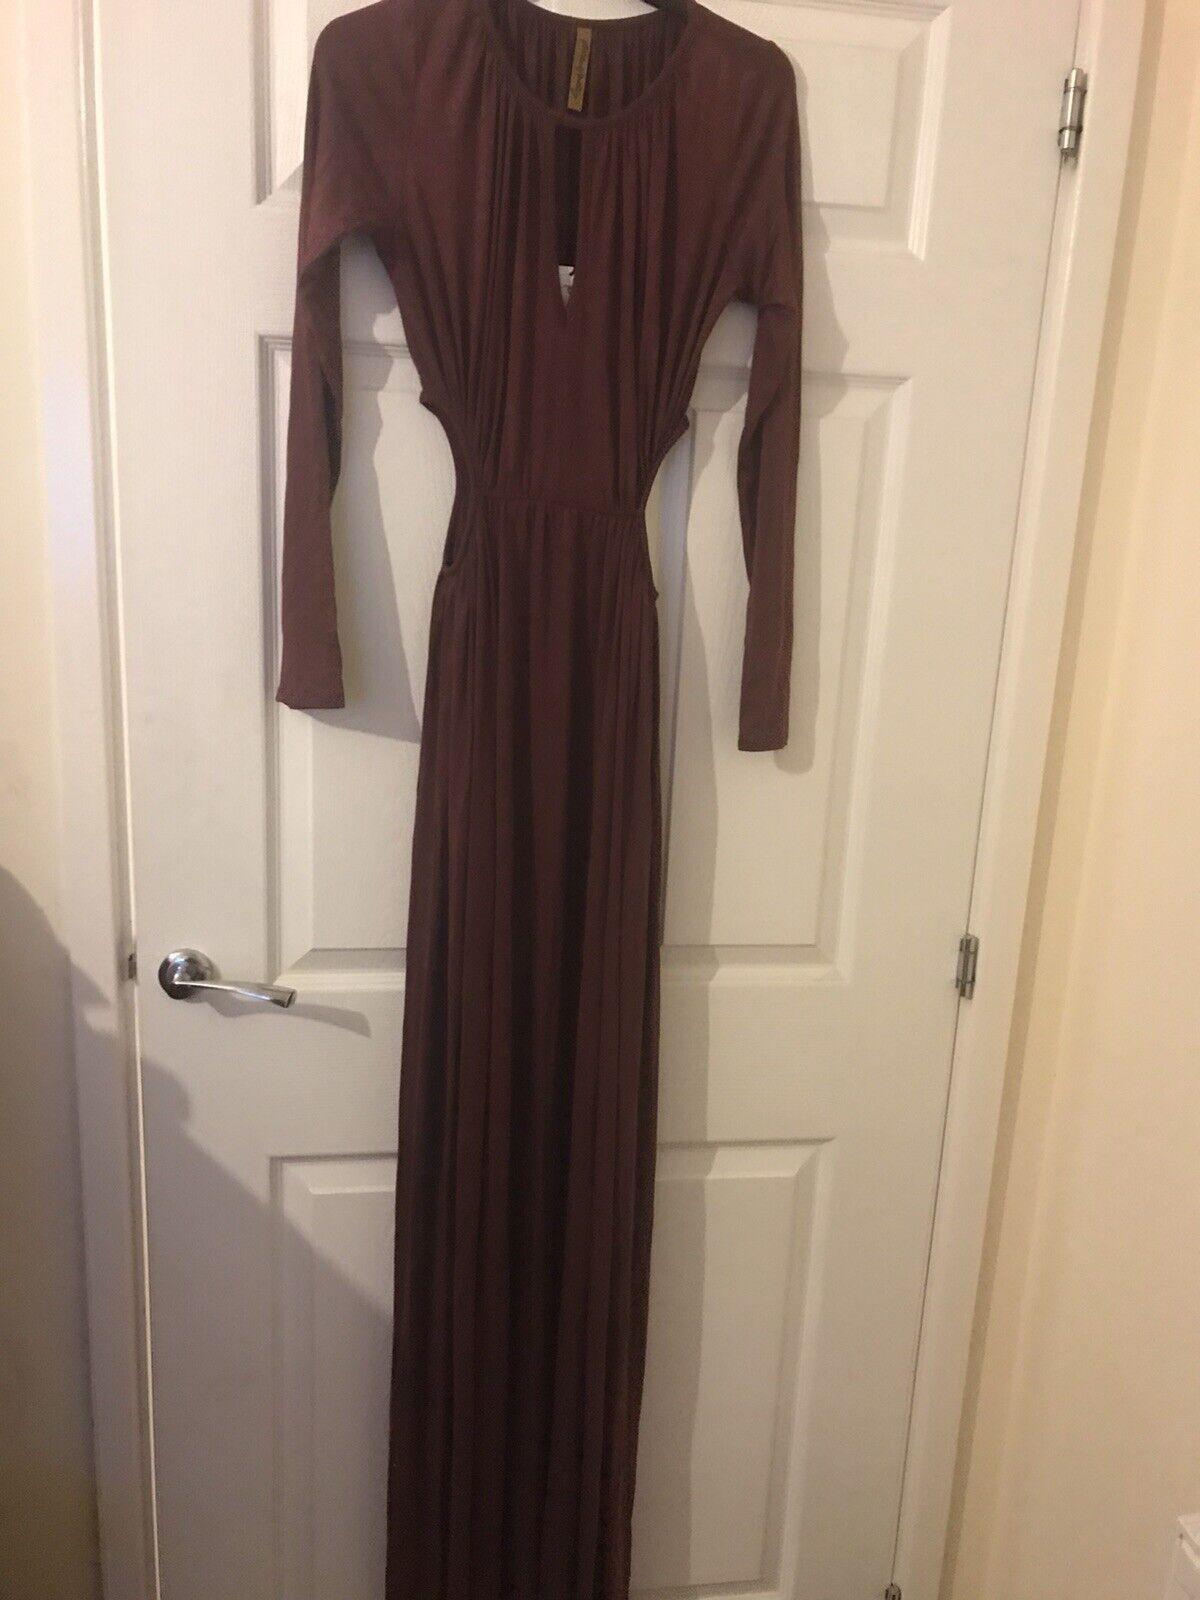 Rahel Pally Pinot Jazz Dress, Long Sleeve, Front neckline keyhole, Size M